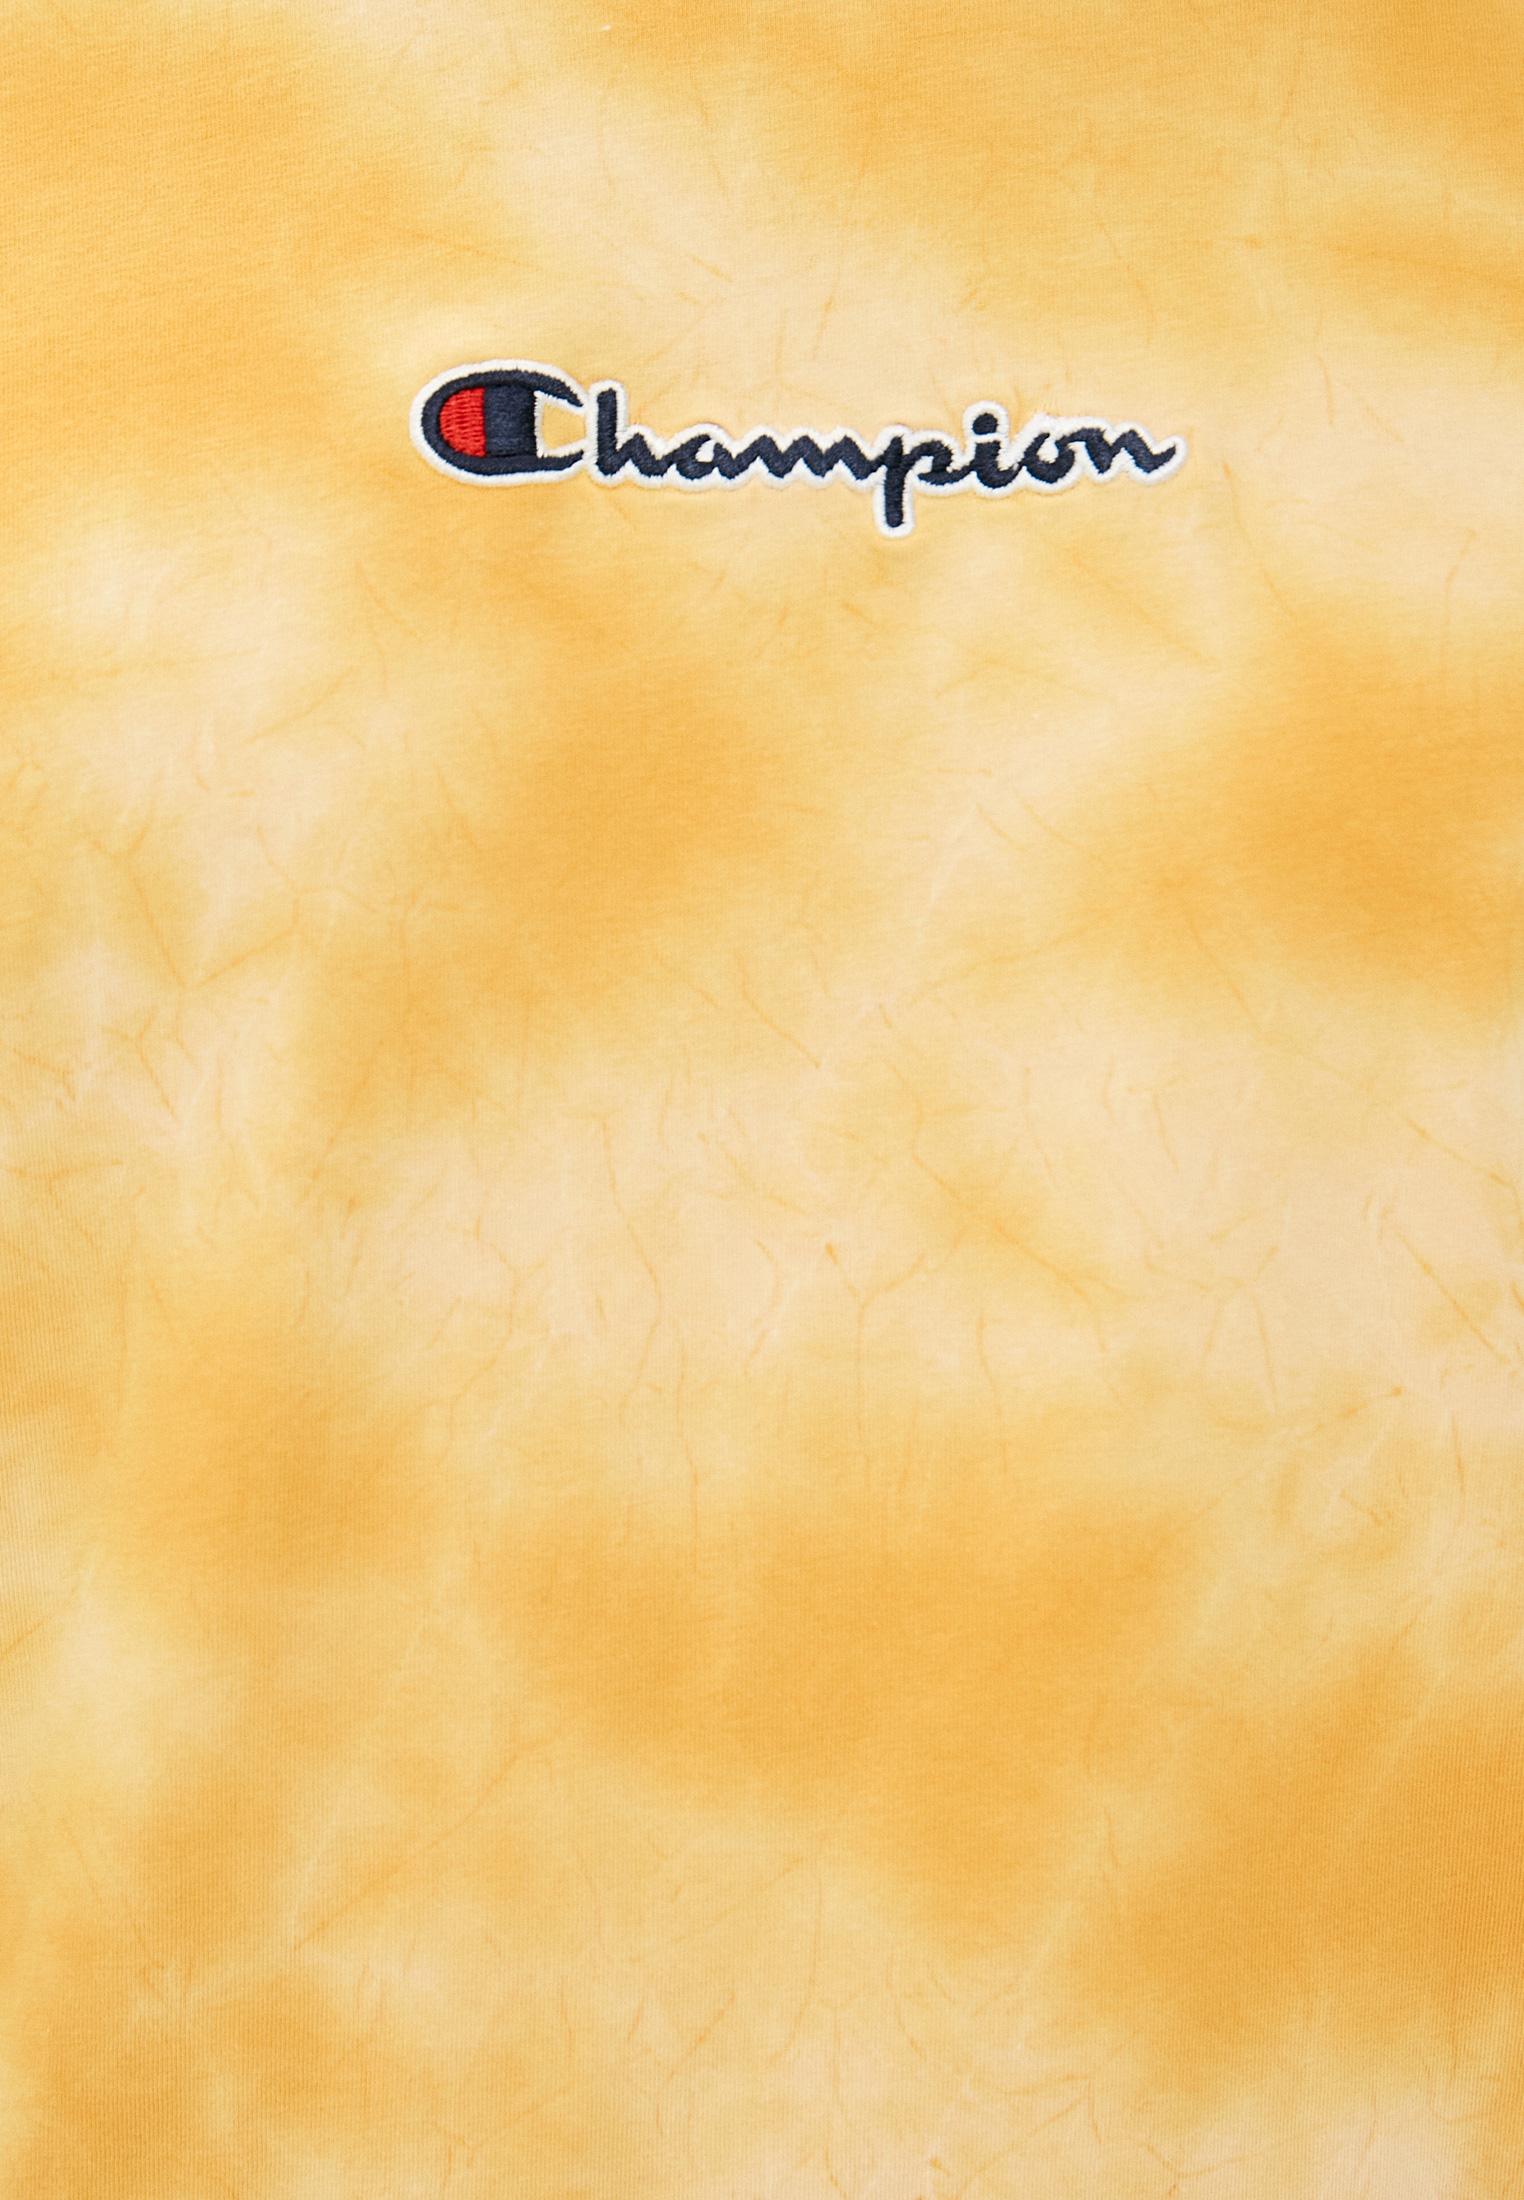 Футболка Champion (Чемпион) 216164: изображение 3